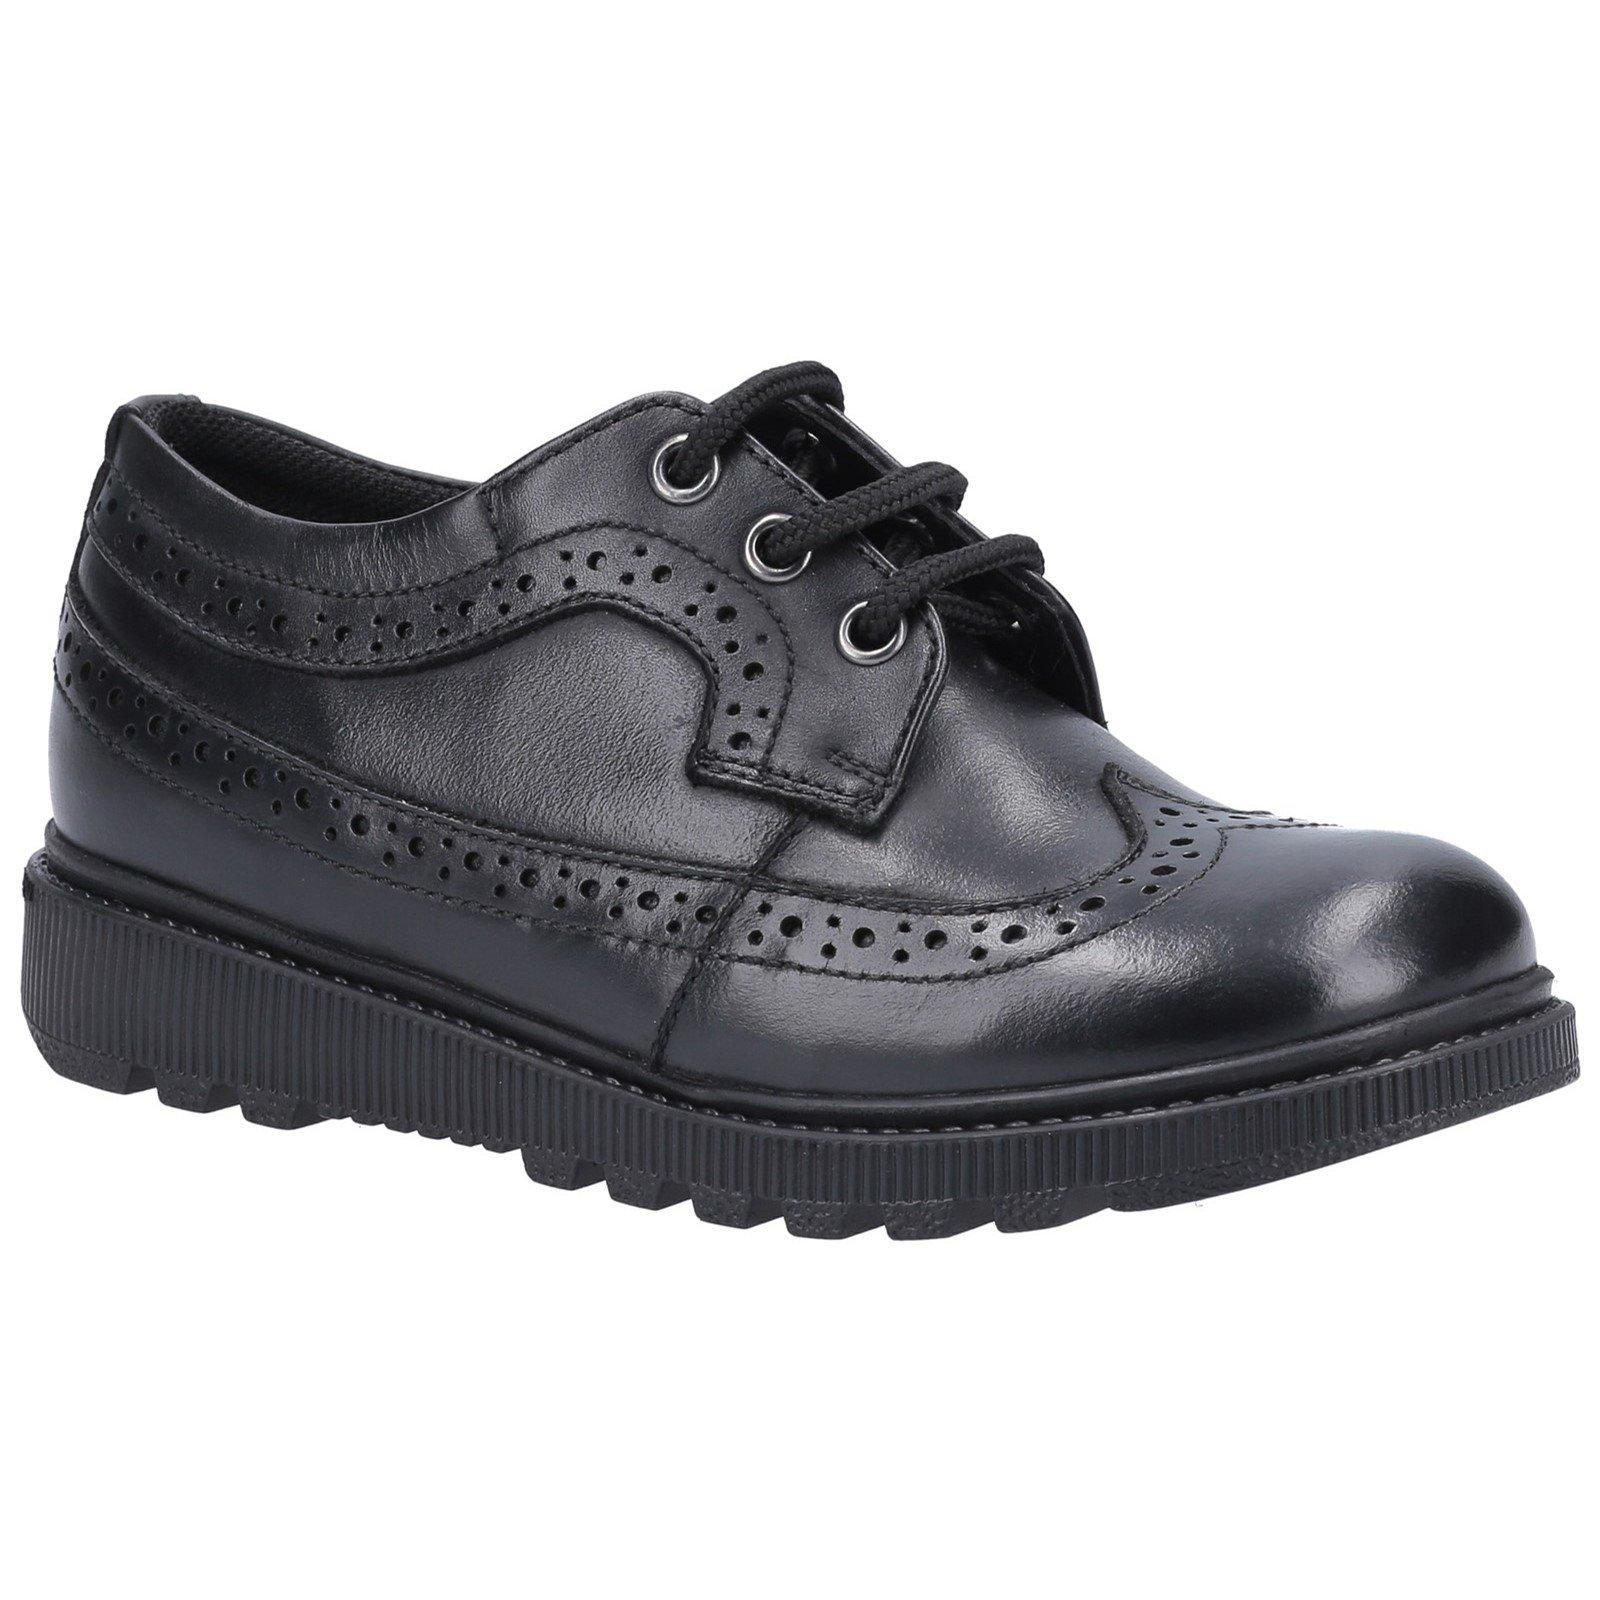 Hush Puppies Kid's Felicity Junior School Oxford Shoe Black 30849 - Black 2